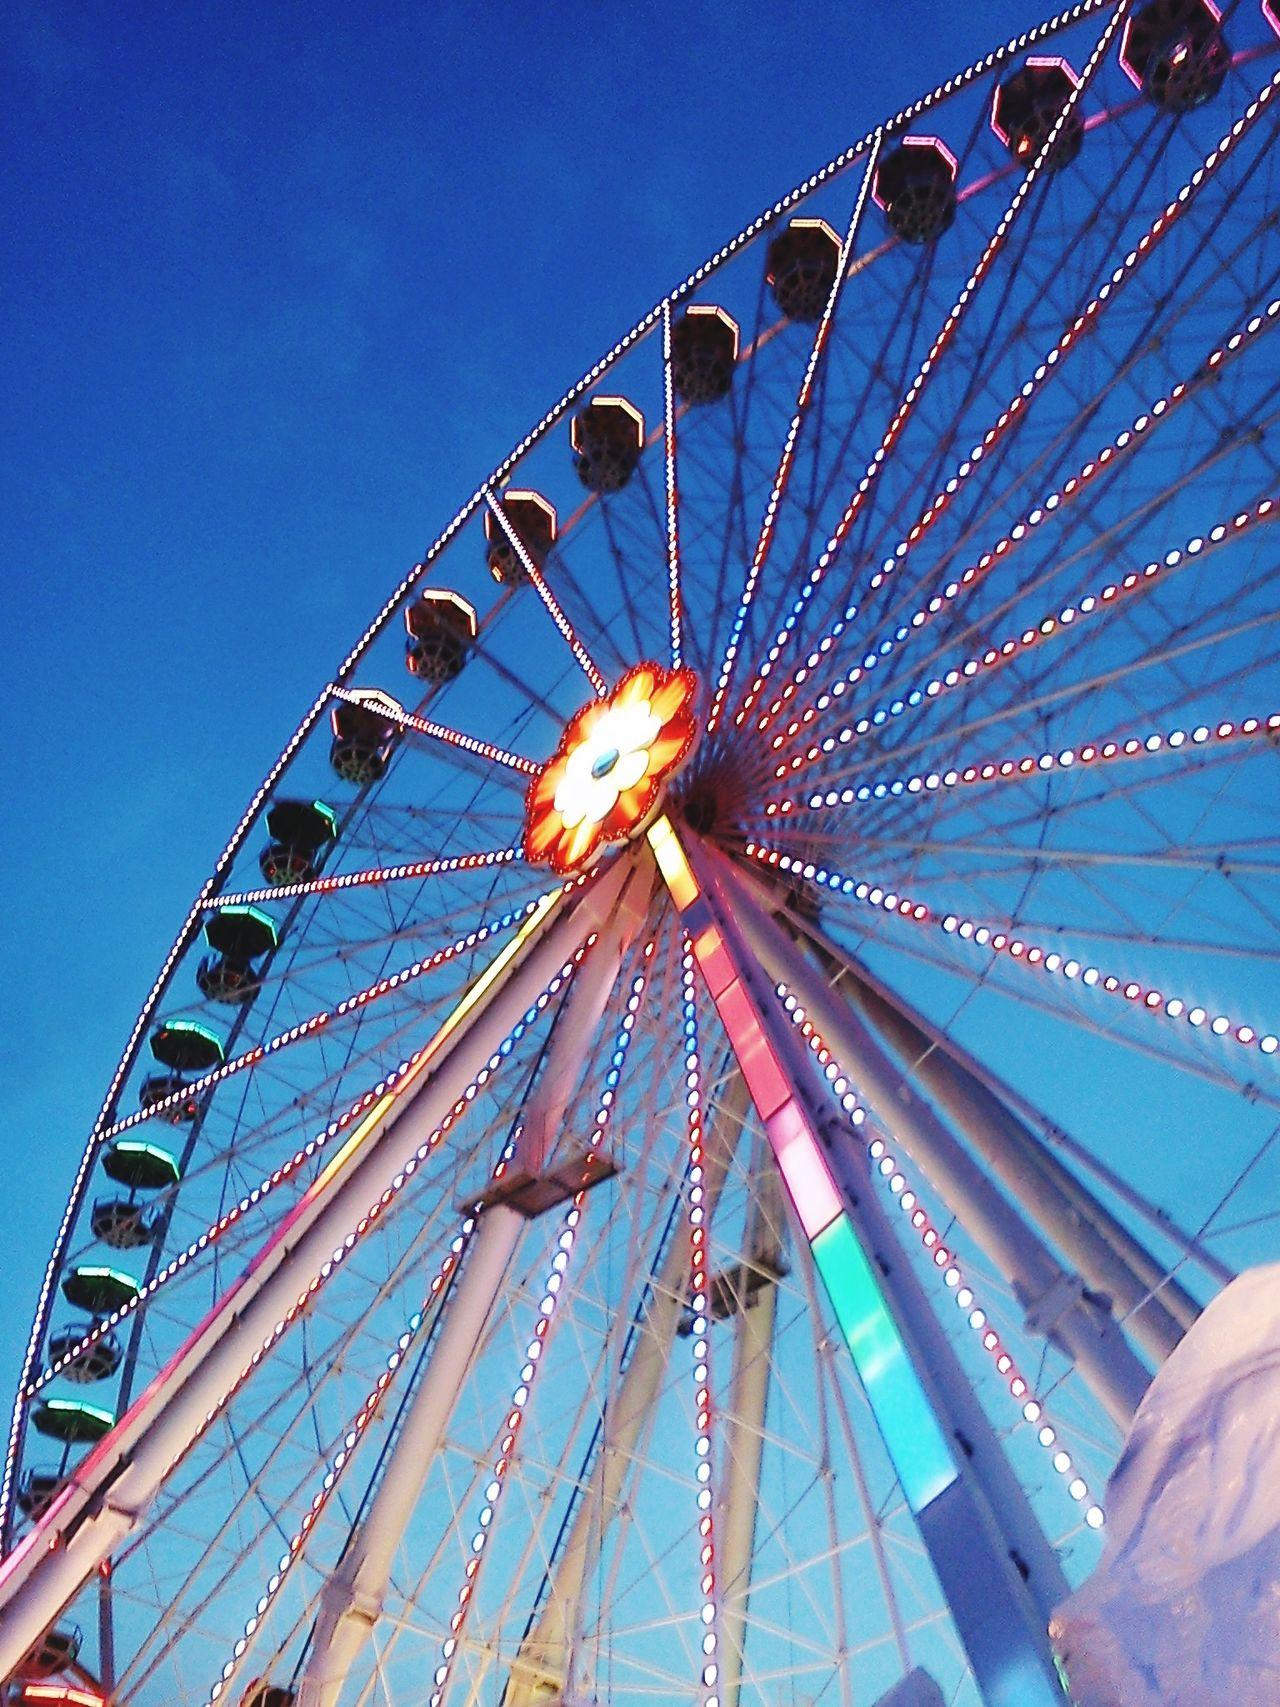 Ferris Wheel Night Outdoors Leisure Activity Prater/Vienna Prater Praterstern Prater Vienna Wheel Lights Colours